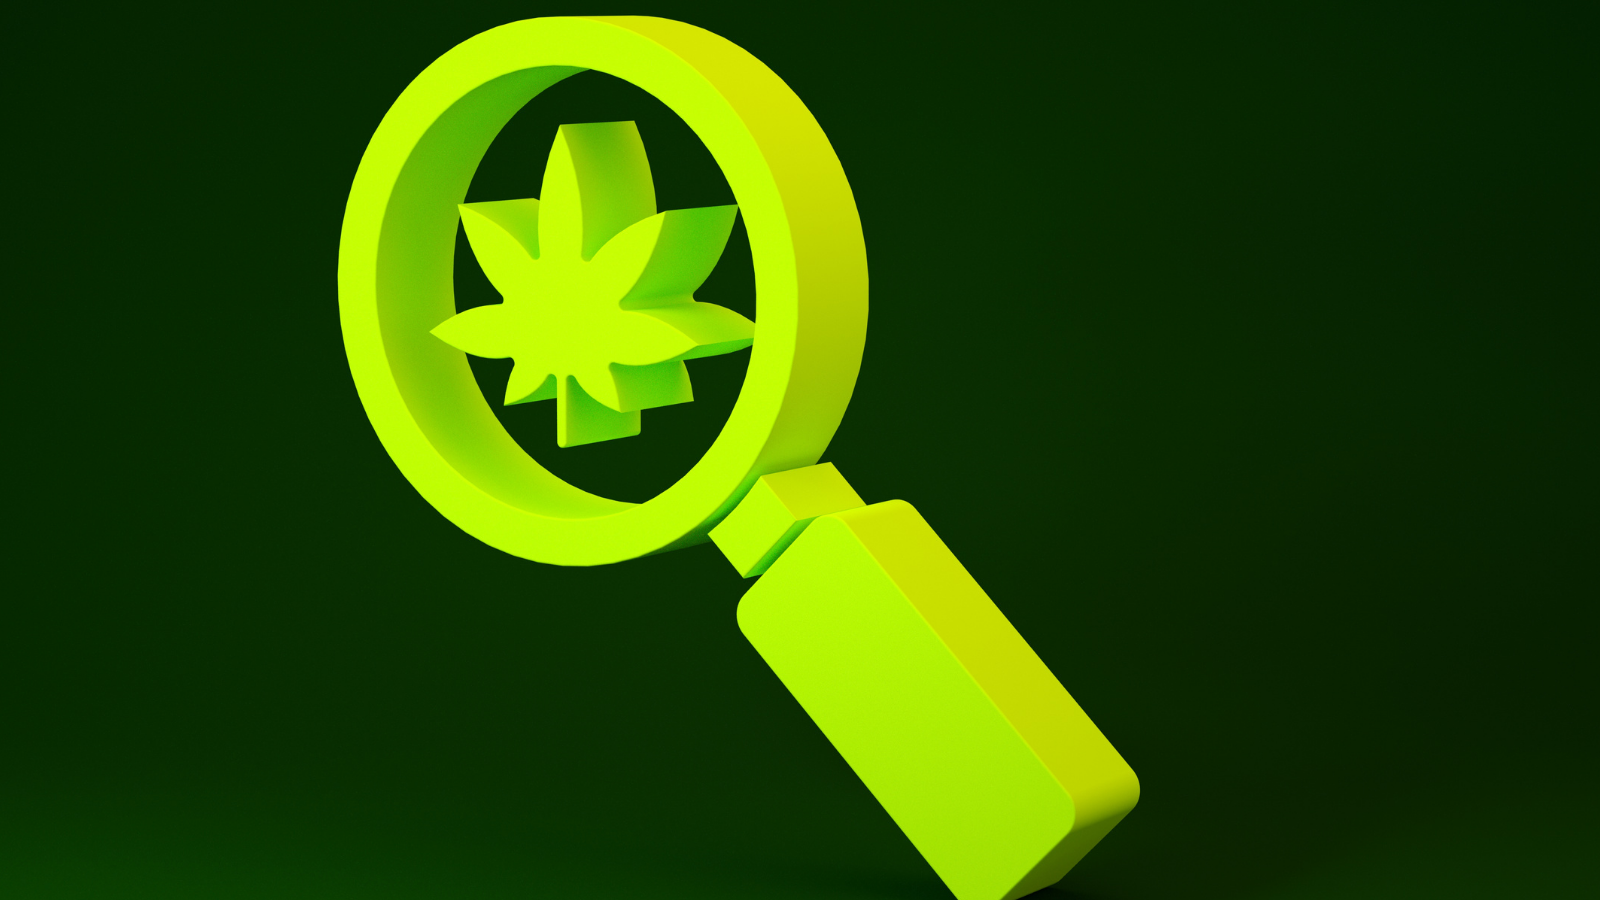 5 Cannabis Marketing Alternatives to Help Retailers Improve Sales Performance